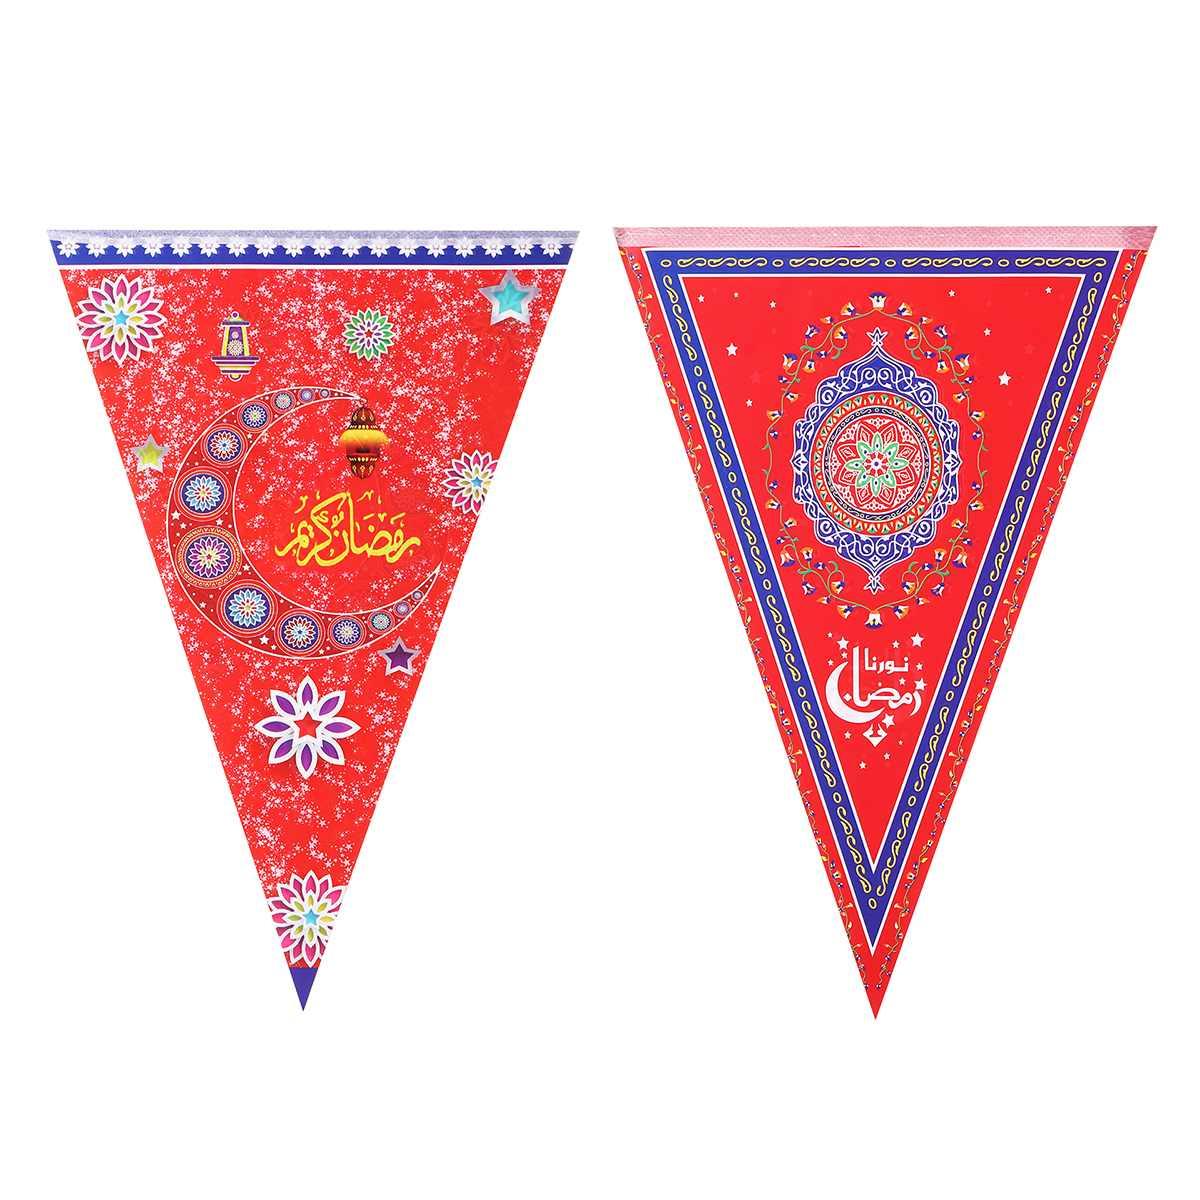 10pcs Ramadan Eid Flag Ramadan Muslim Festival Ramadan Flag Party Decoration Home Ramadan Decor Eid Decorations Islamic Gift